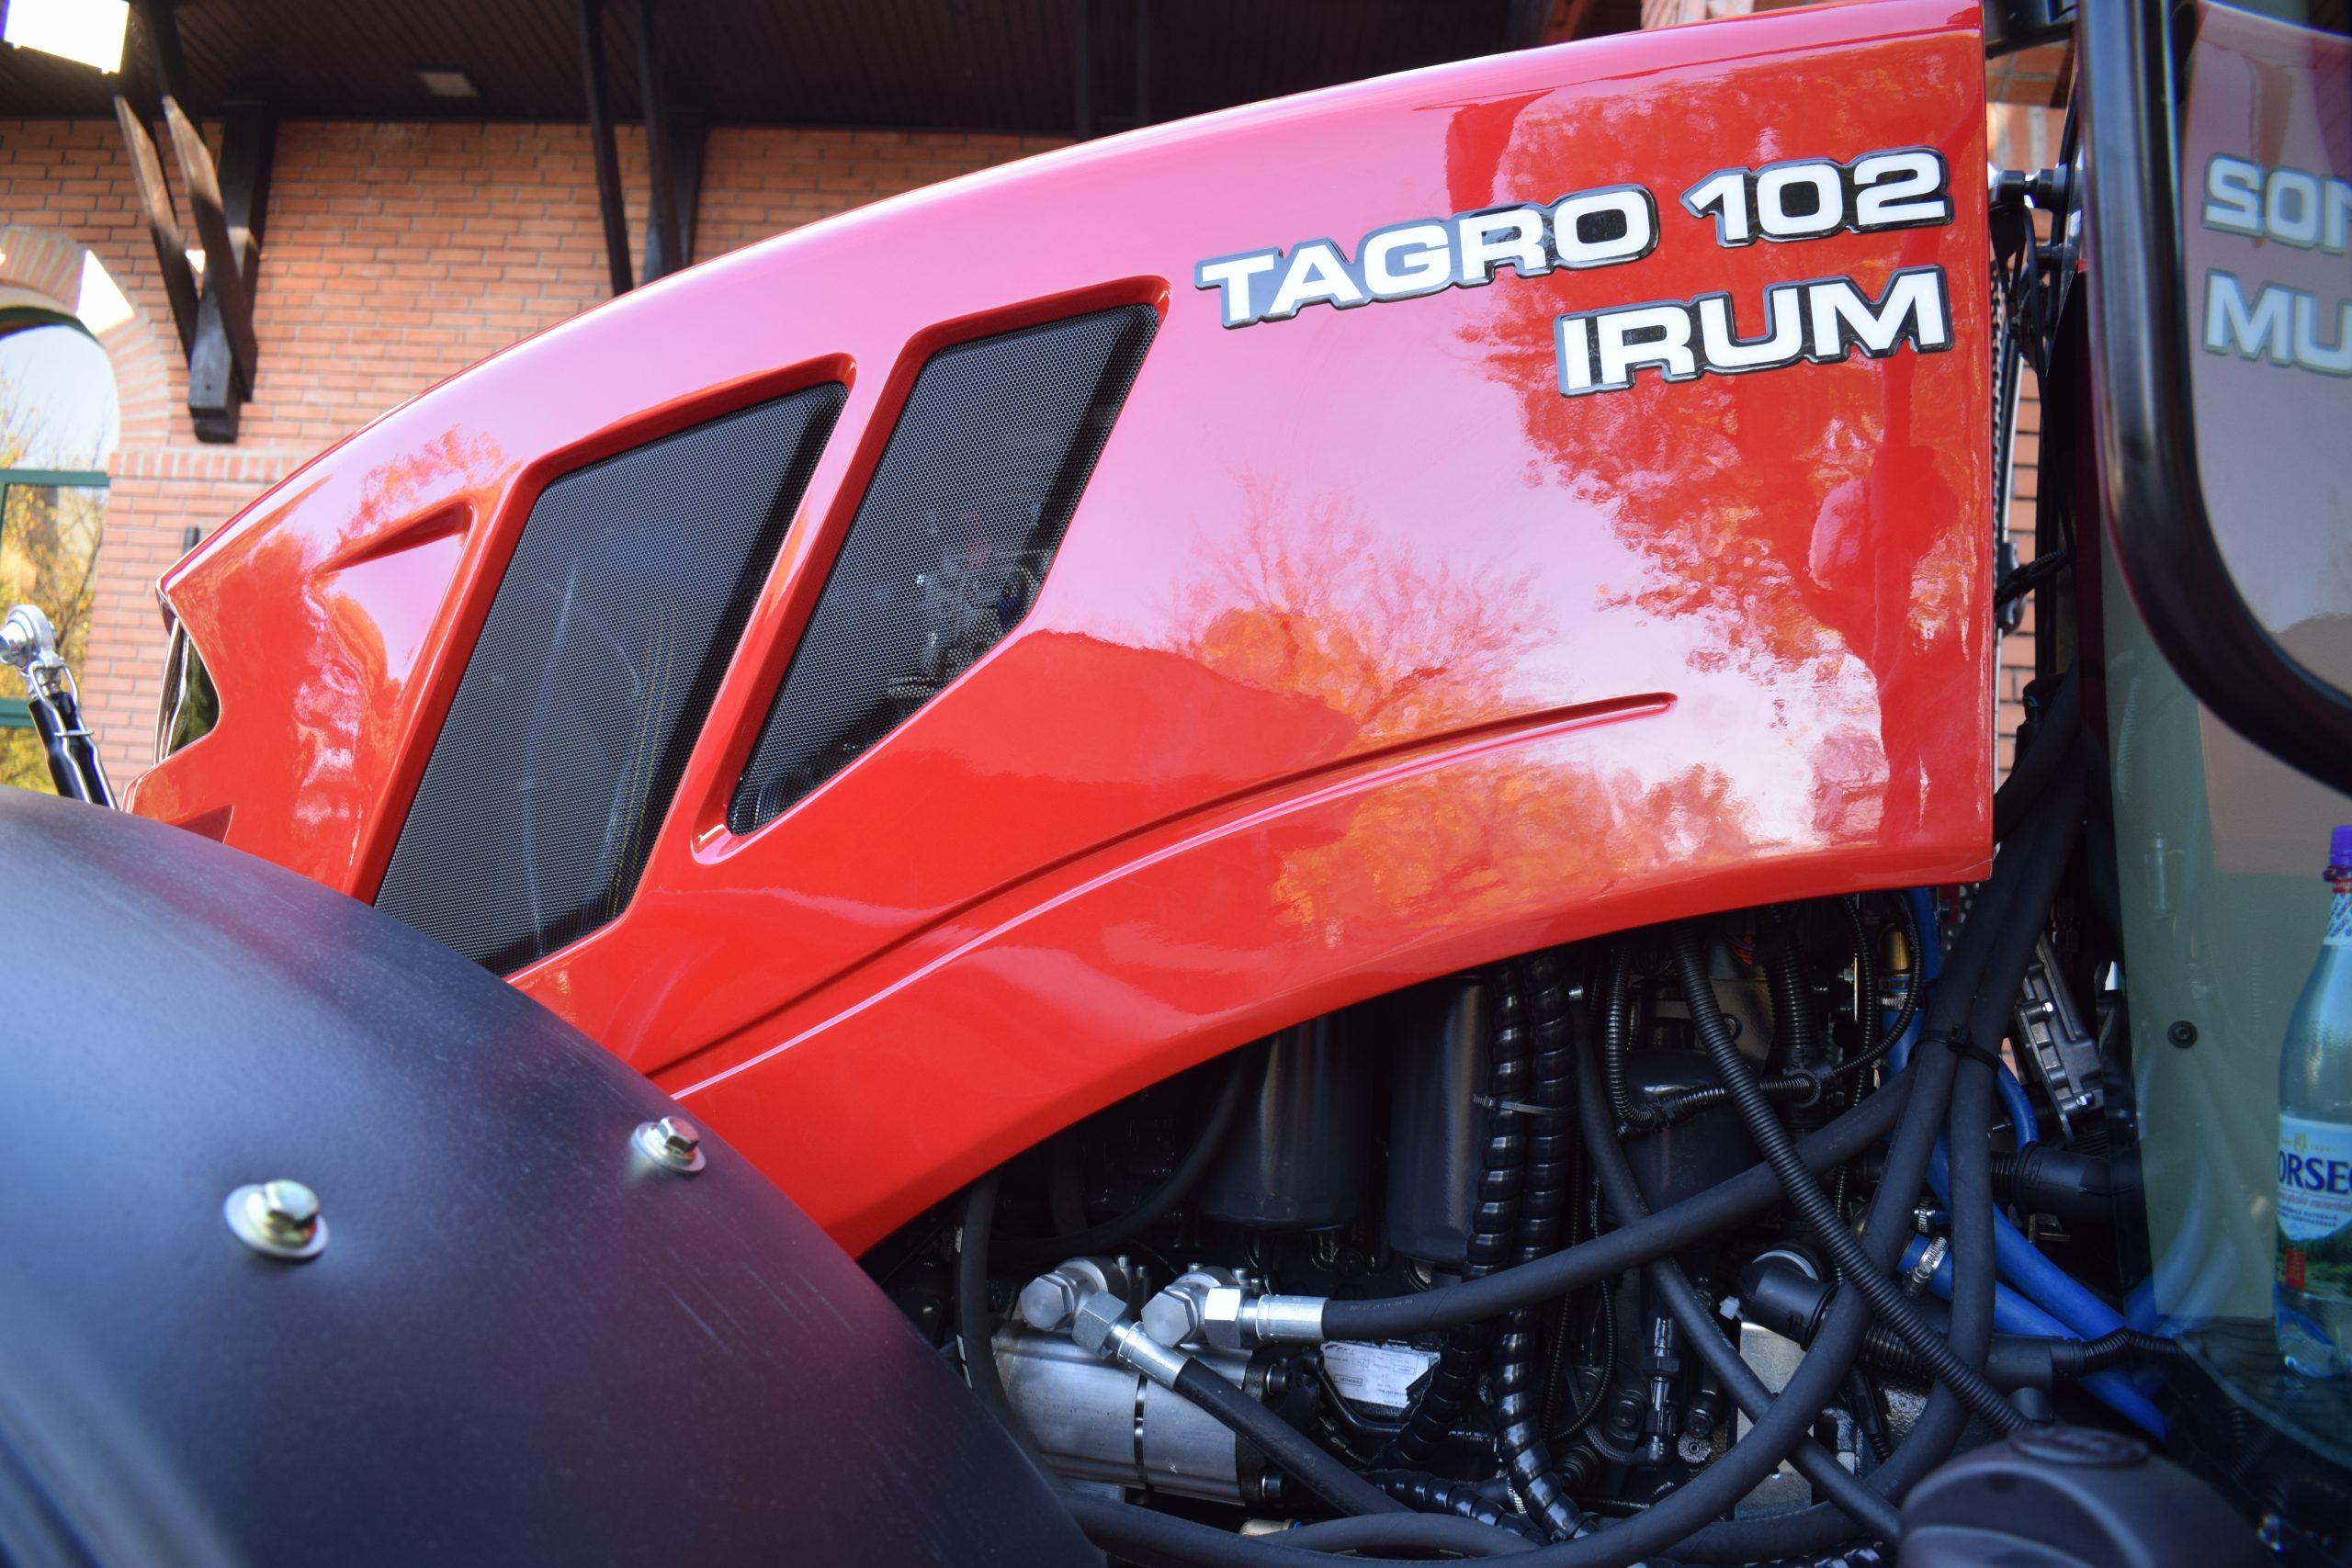 Tractor romanesc Tagro Irum lateral cu numele